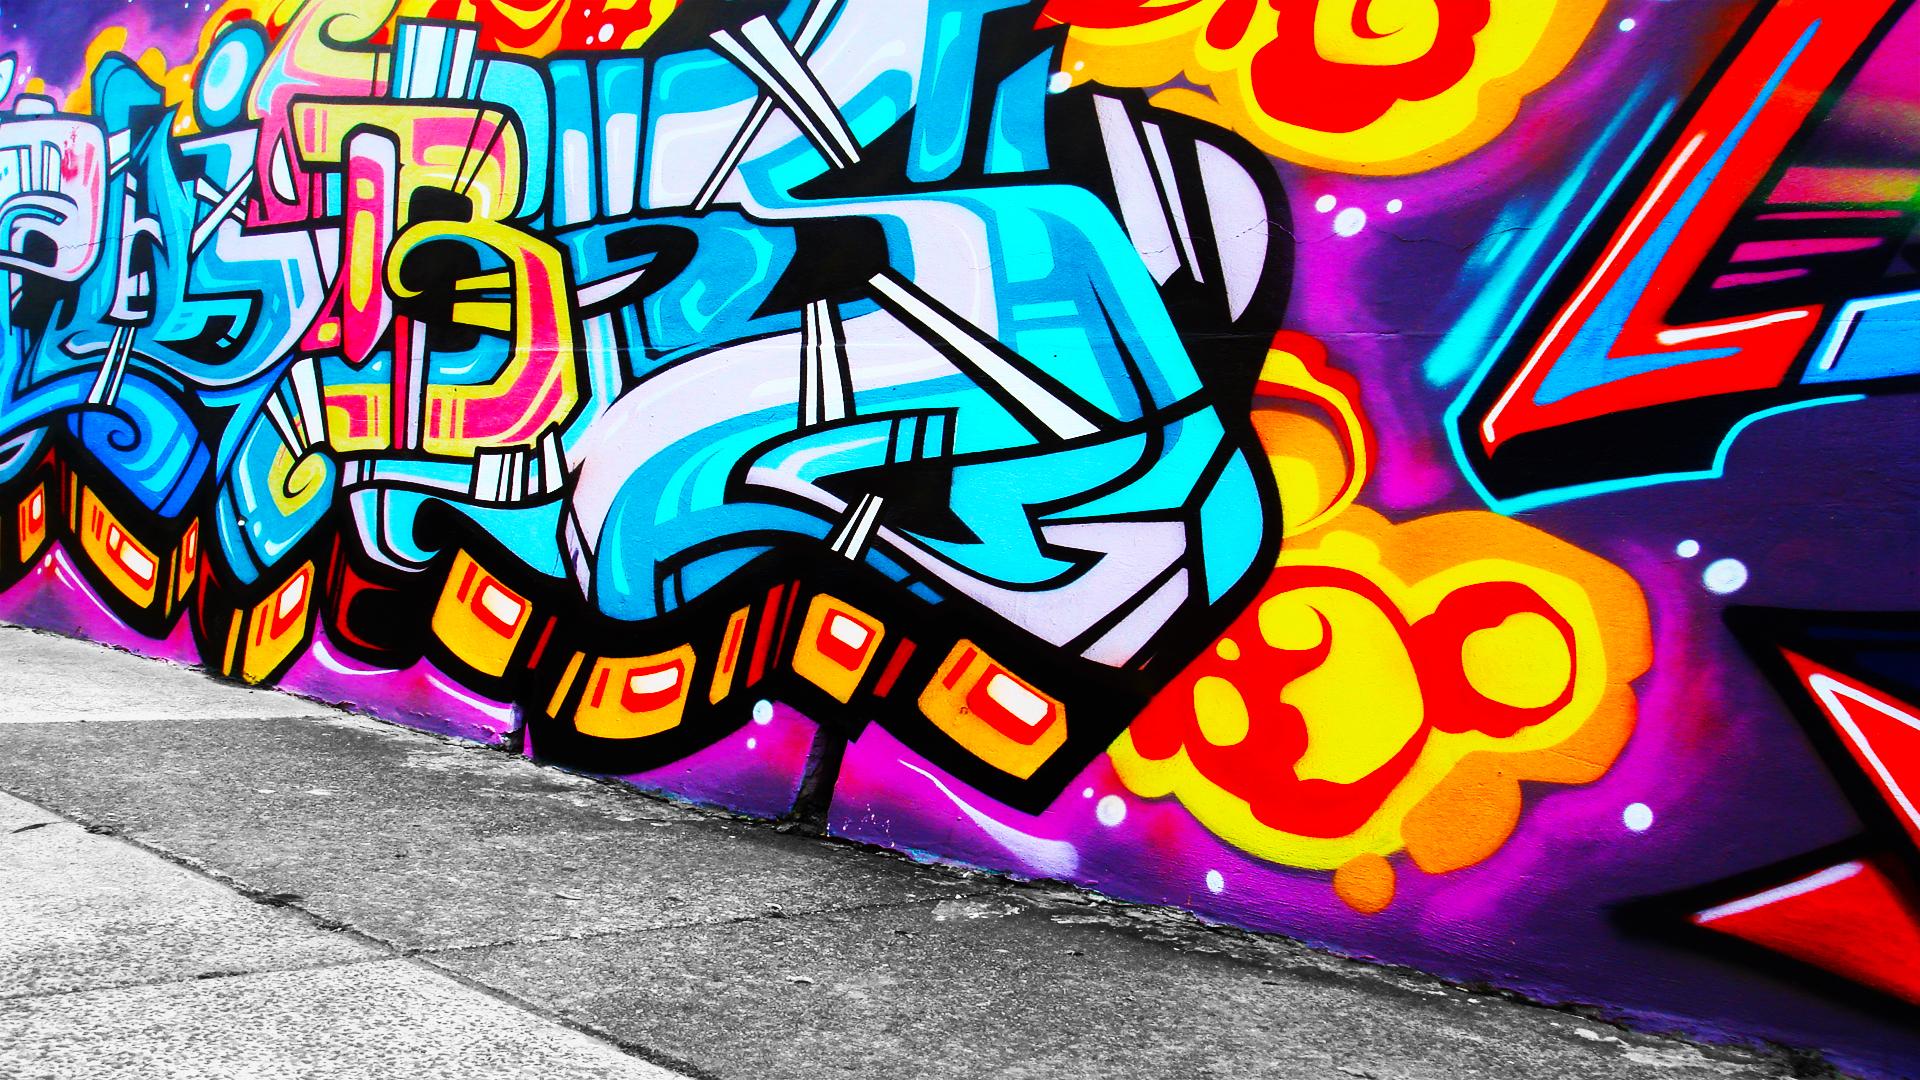 Image for Cool Graffiti Wallpaper